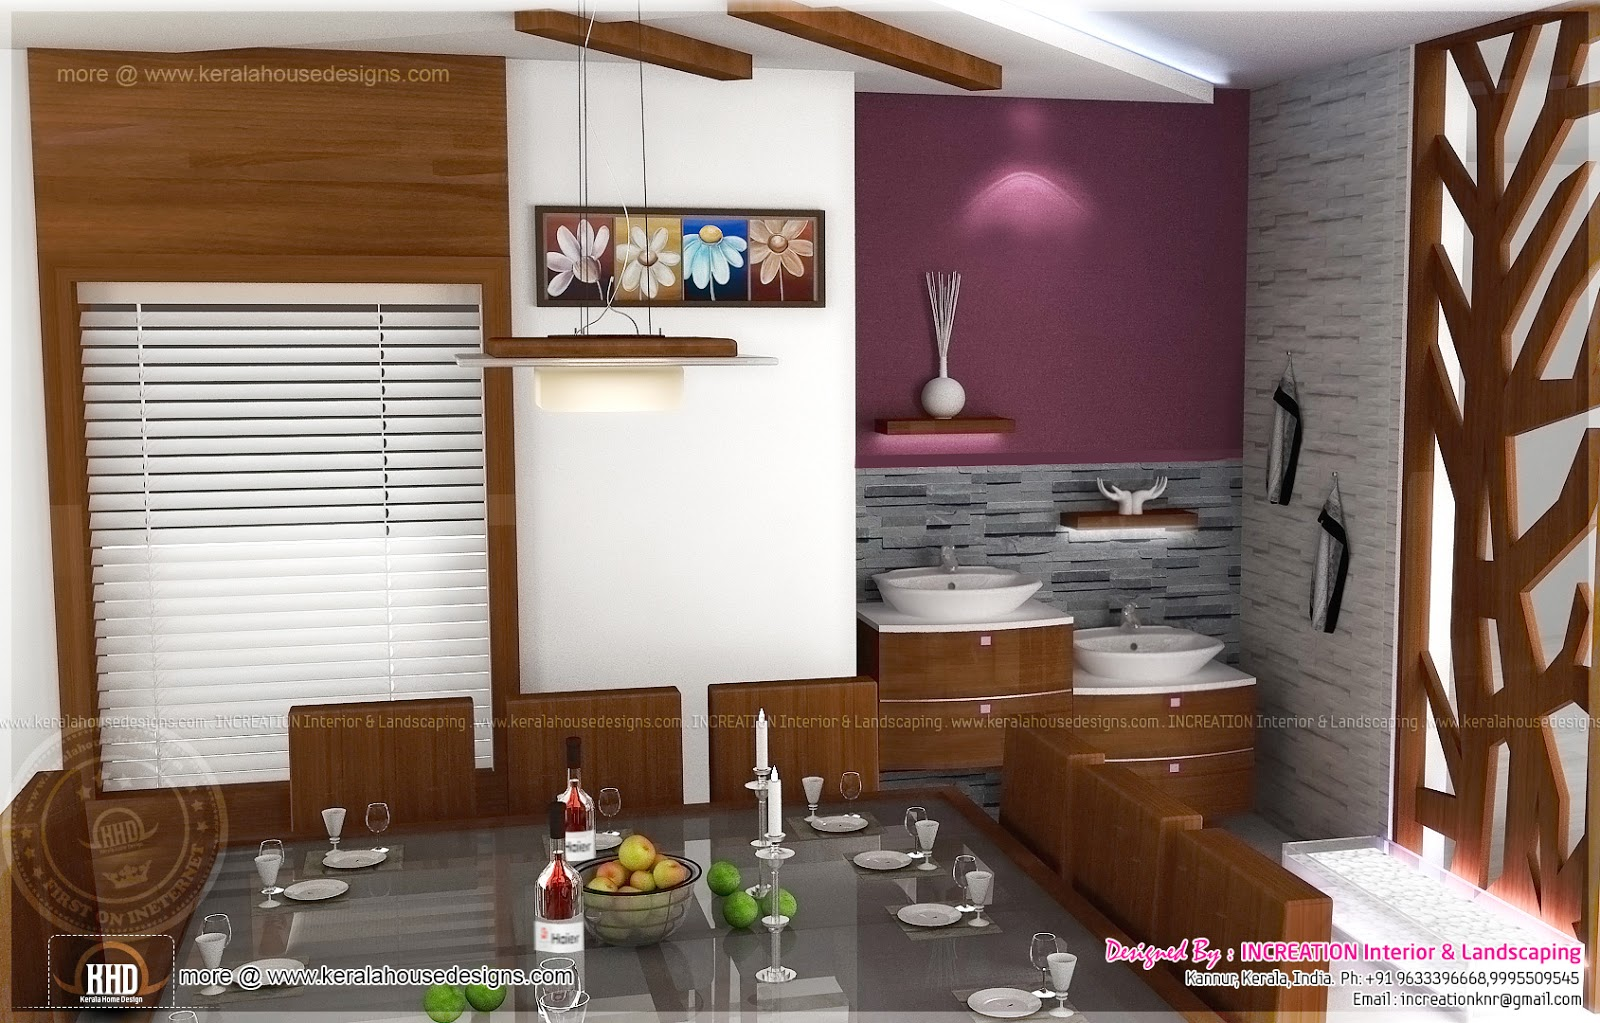 Interior designs fro